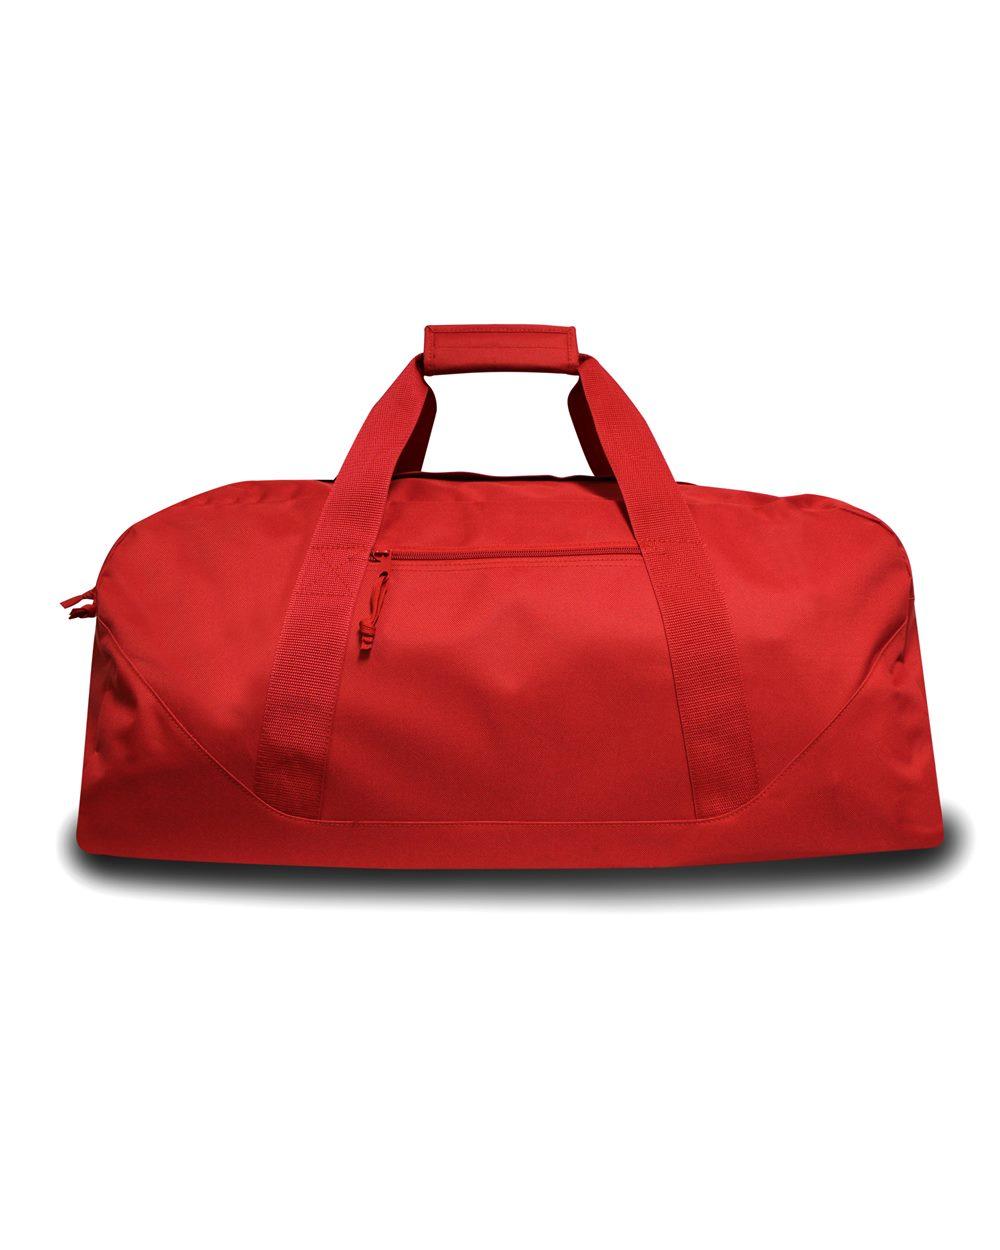 Liberty Bags 8823 - 27inch Dome Duffel